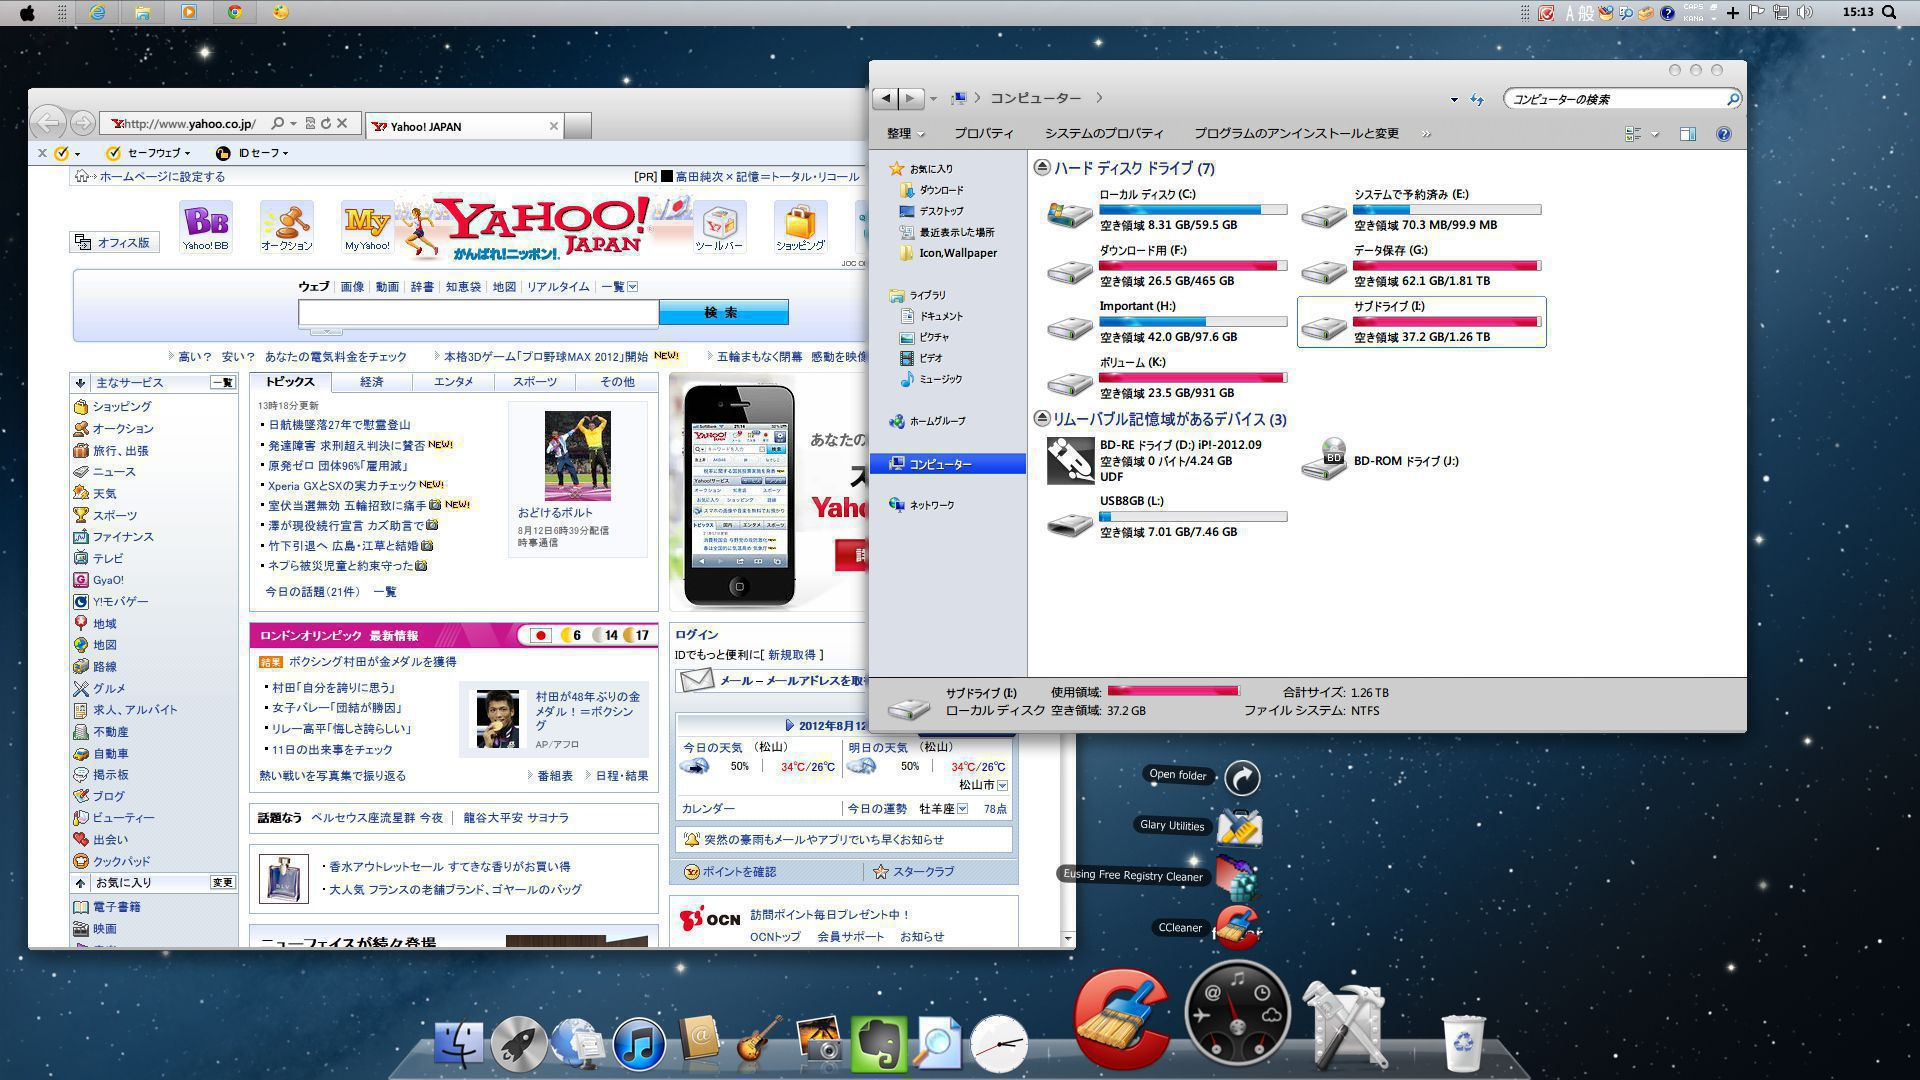 Windows 7 をmac Os X Mountain Lion 風にカスタマイズ